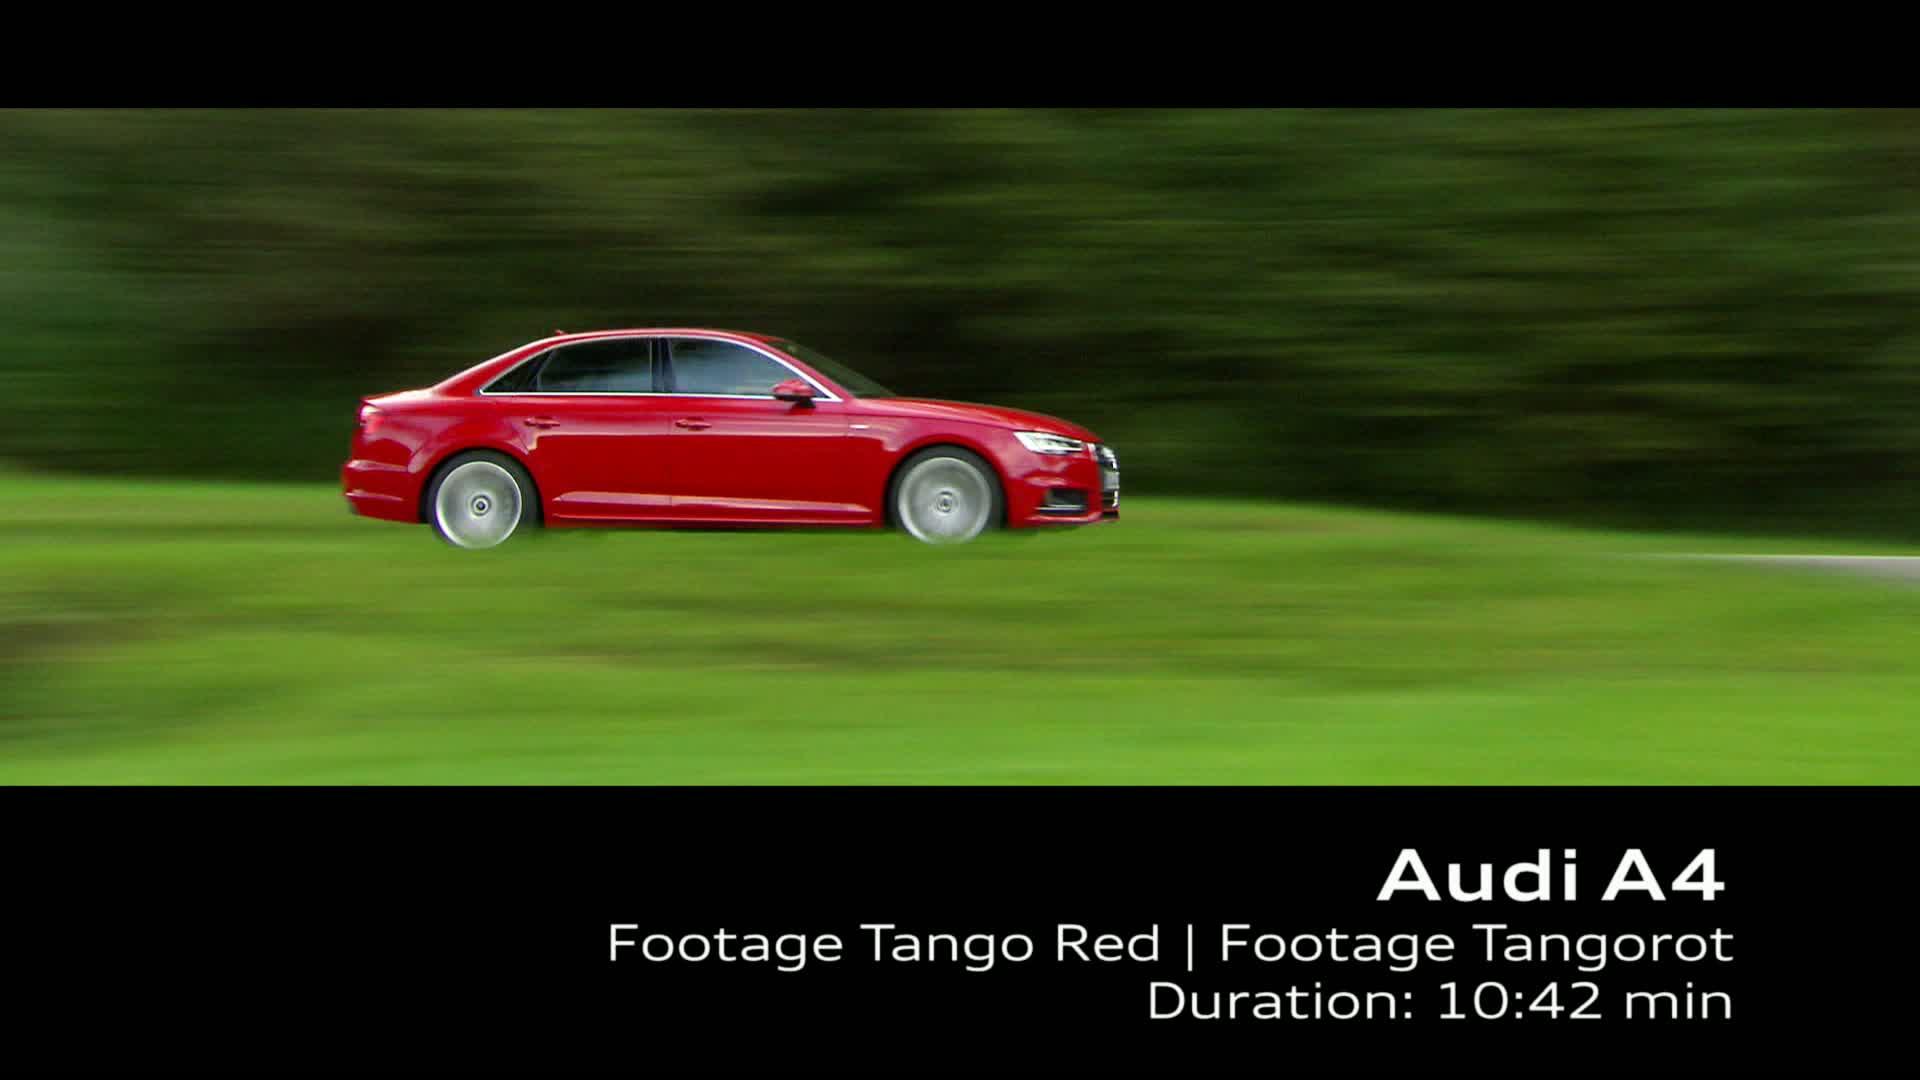 Audi A4 Sedan - Footage Tango Red